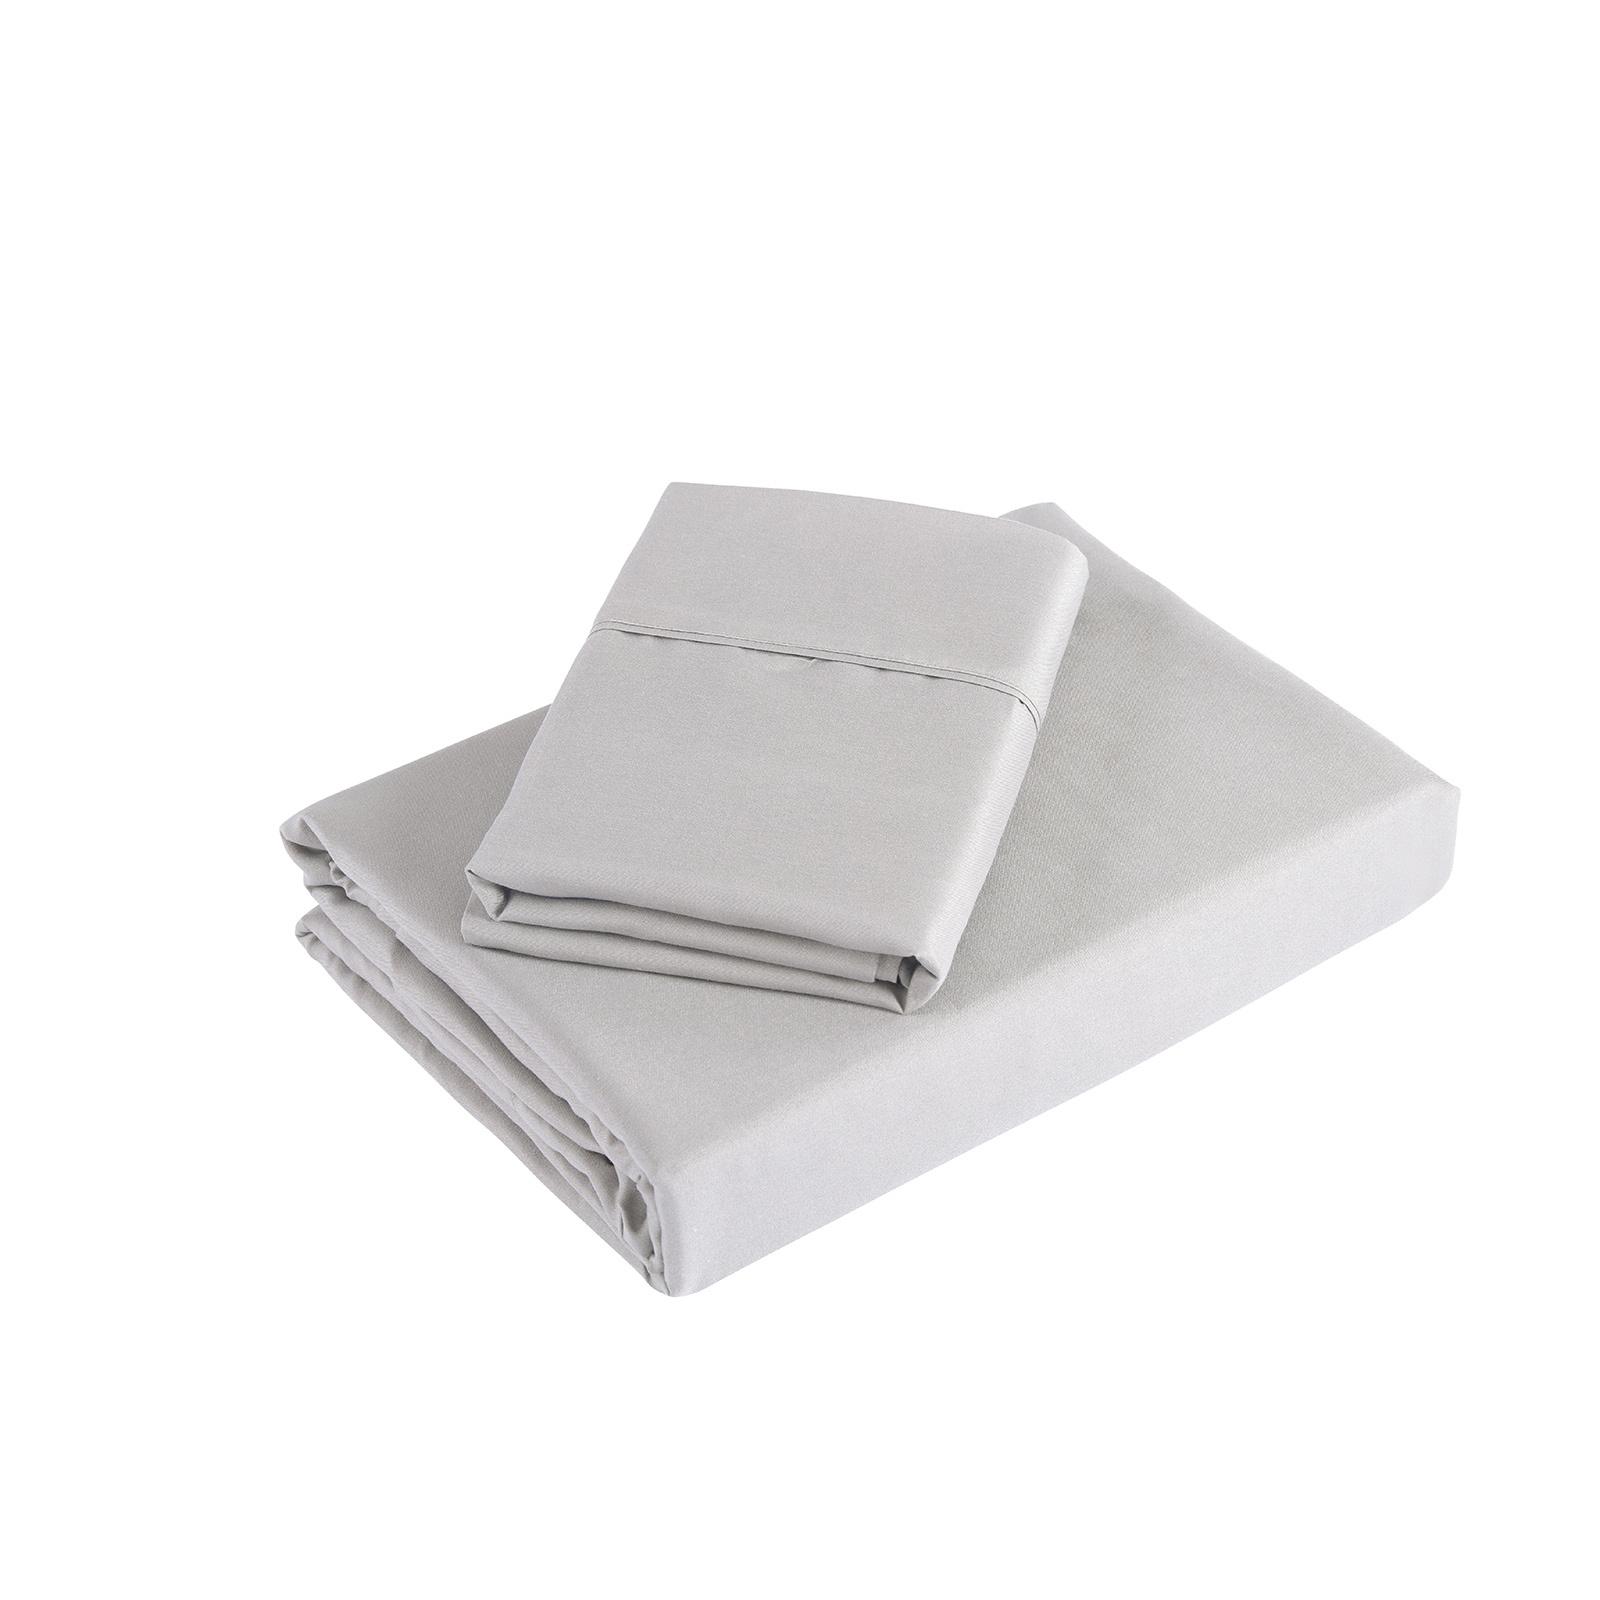 Royal Comfort 1200 Thread Count Ultrasoft 4 Piece Sheet Set - King - Silver image